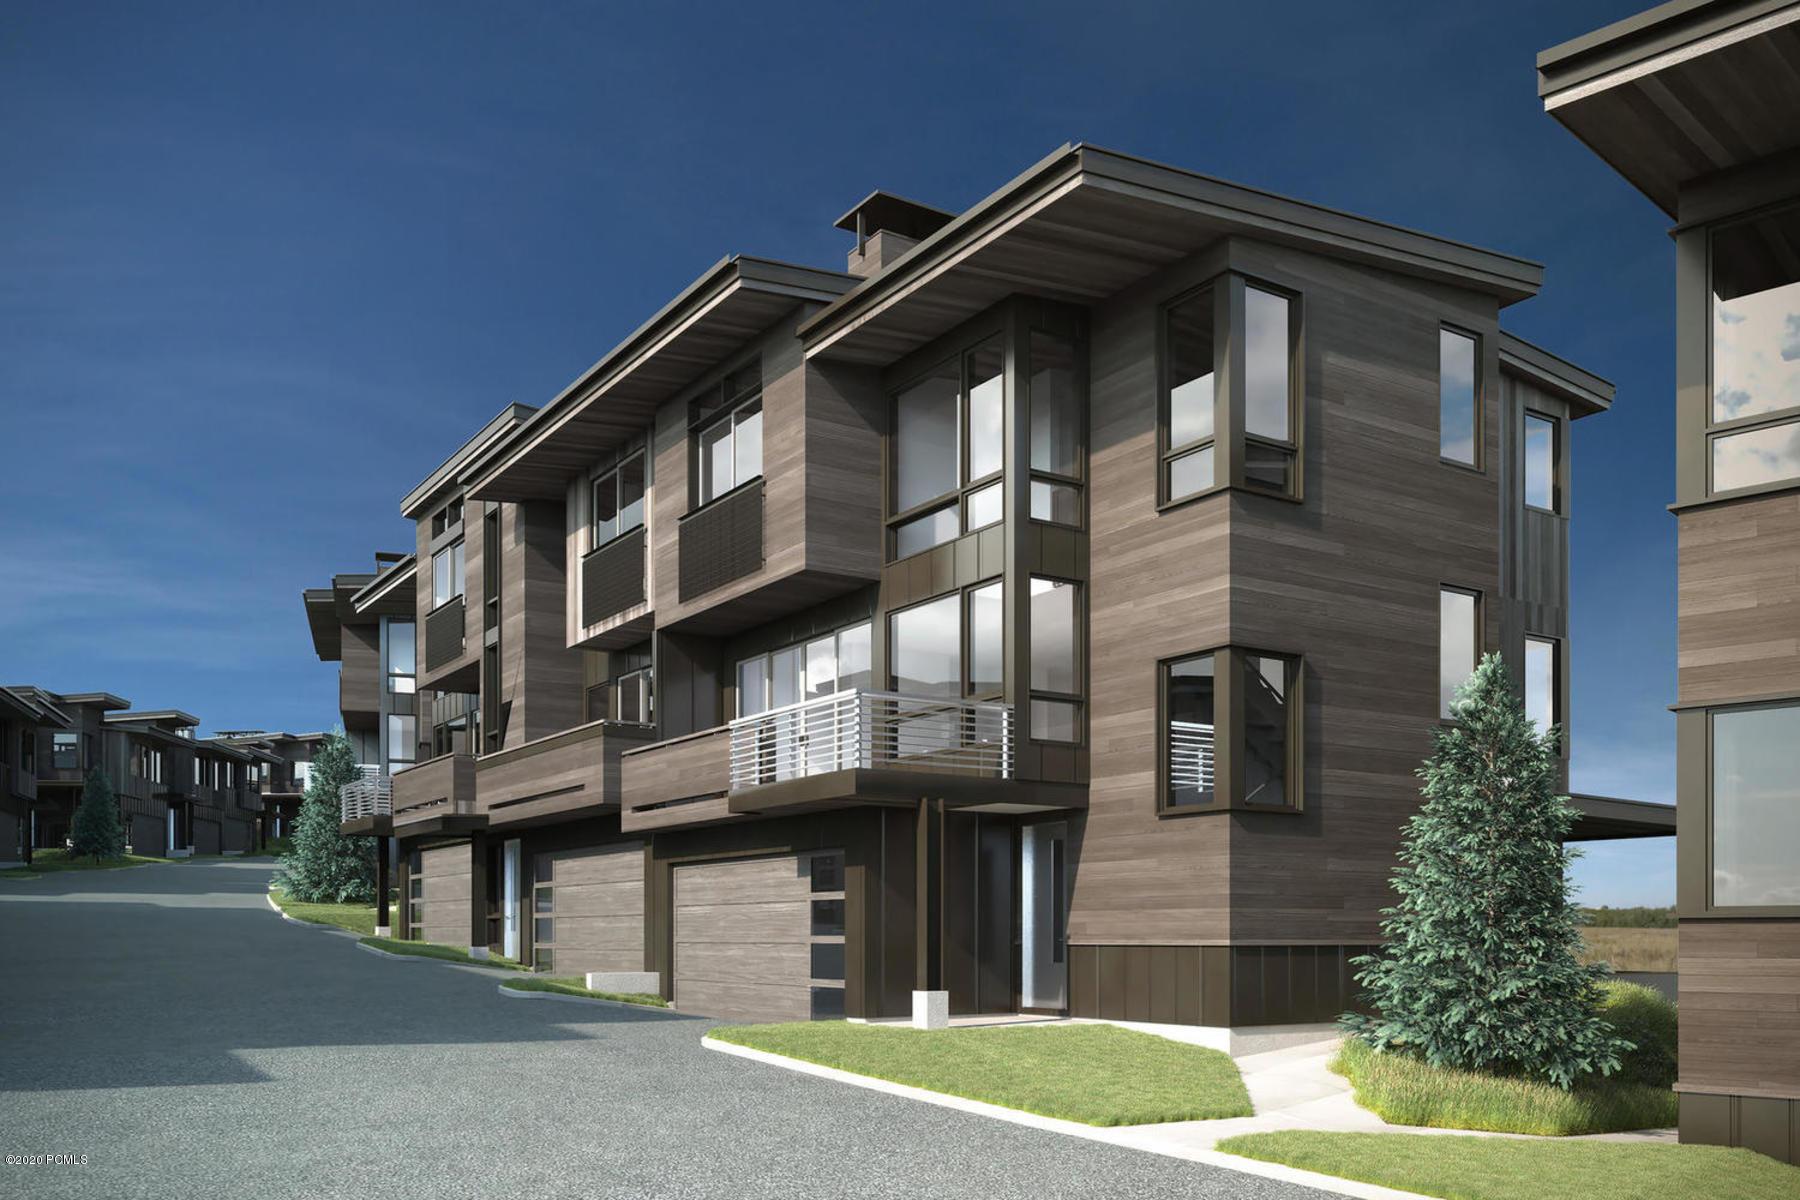 3525 Ridgeline Drive, Park City, Utah 84098, 5 Bedrooms Bedrooms, ,5 BathroomsBathrooms,Condominium,For Sale,Ridgeline,12003356